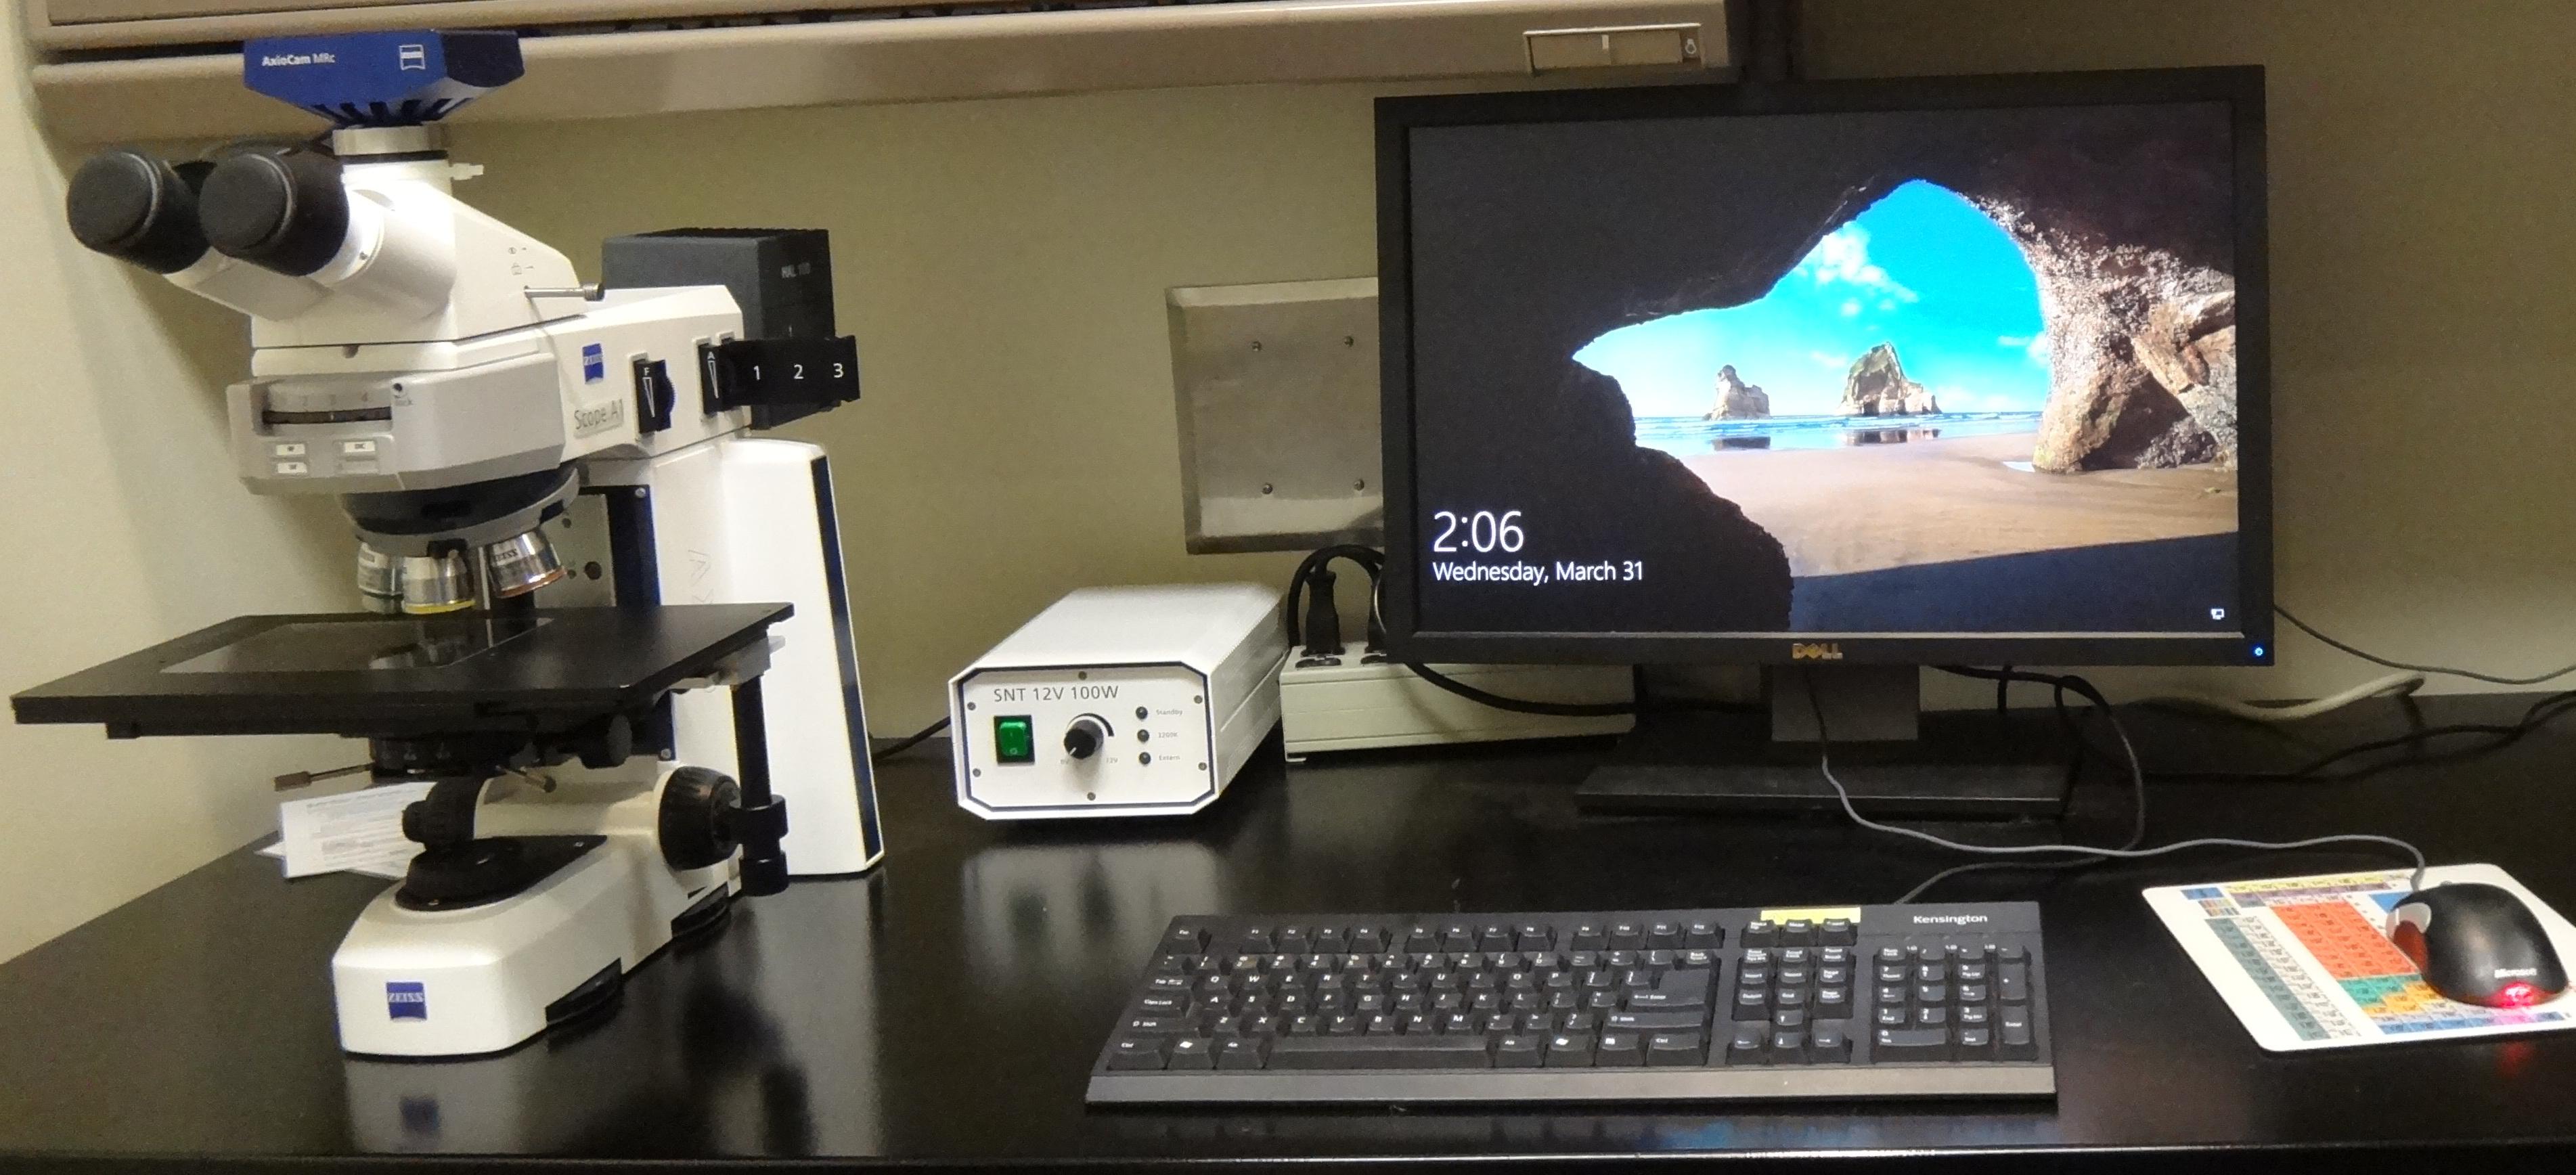 Inspection microscope 2020